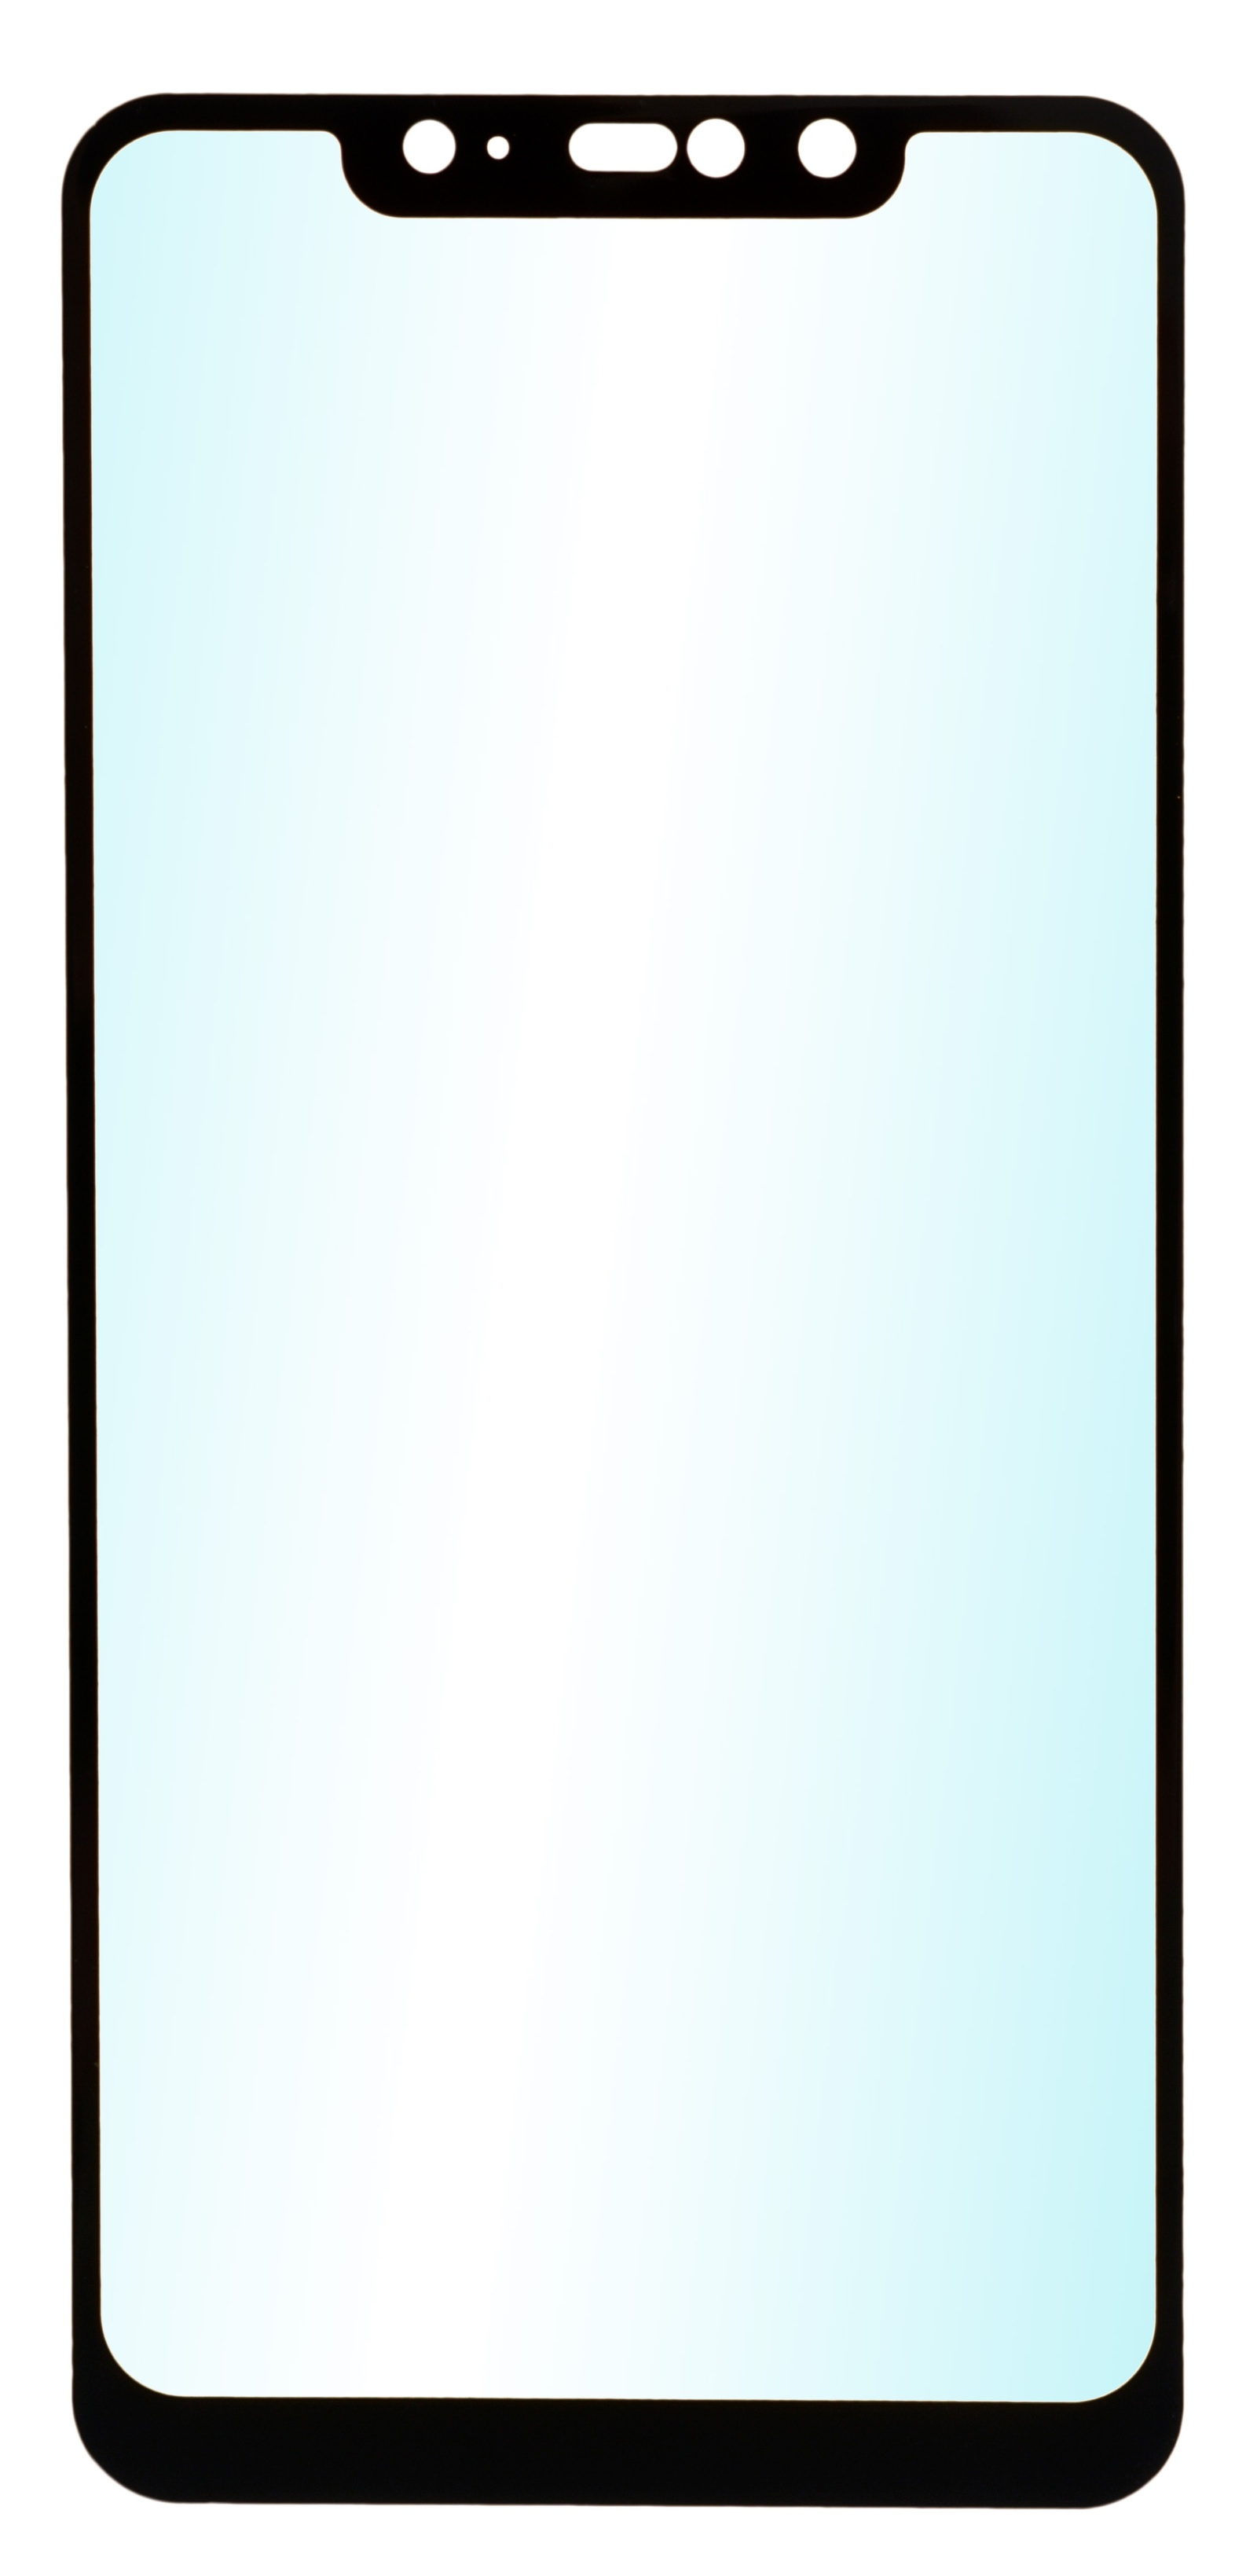 Защитное стекло skinBOX full screen, 4630042522435, черный защитное стекло skinbox full screen 4630042522817 черный